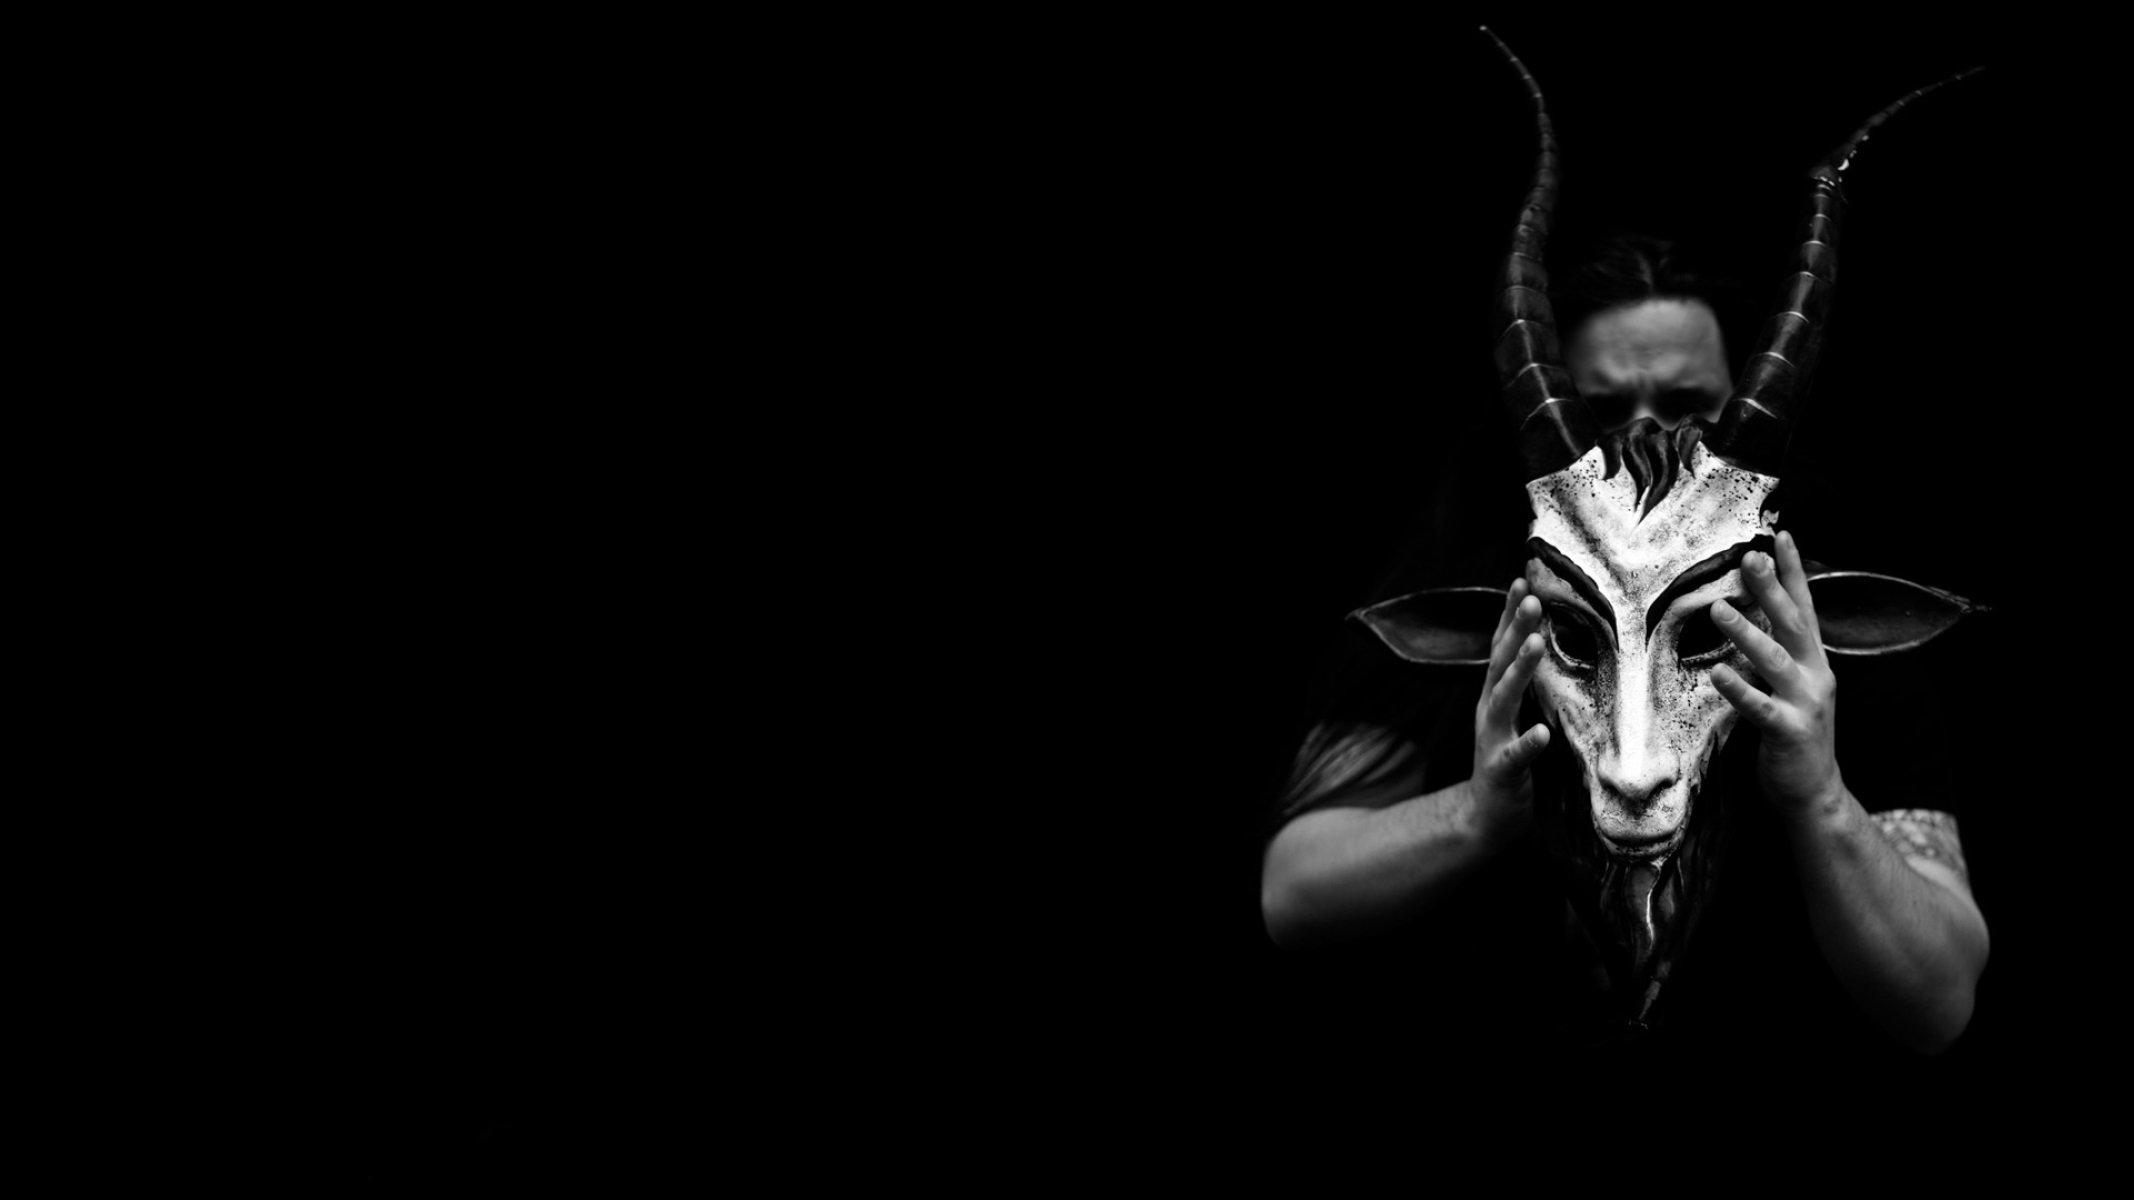 Satanic Occult Evil Dark Demon Satan Wallpaper 2134x1200